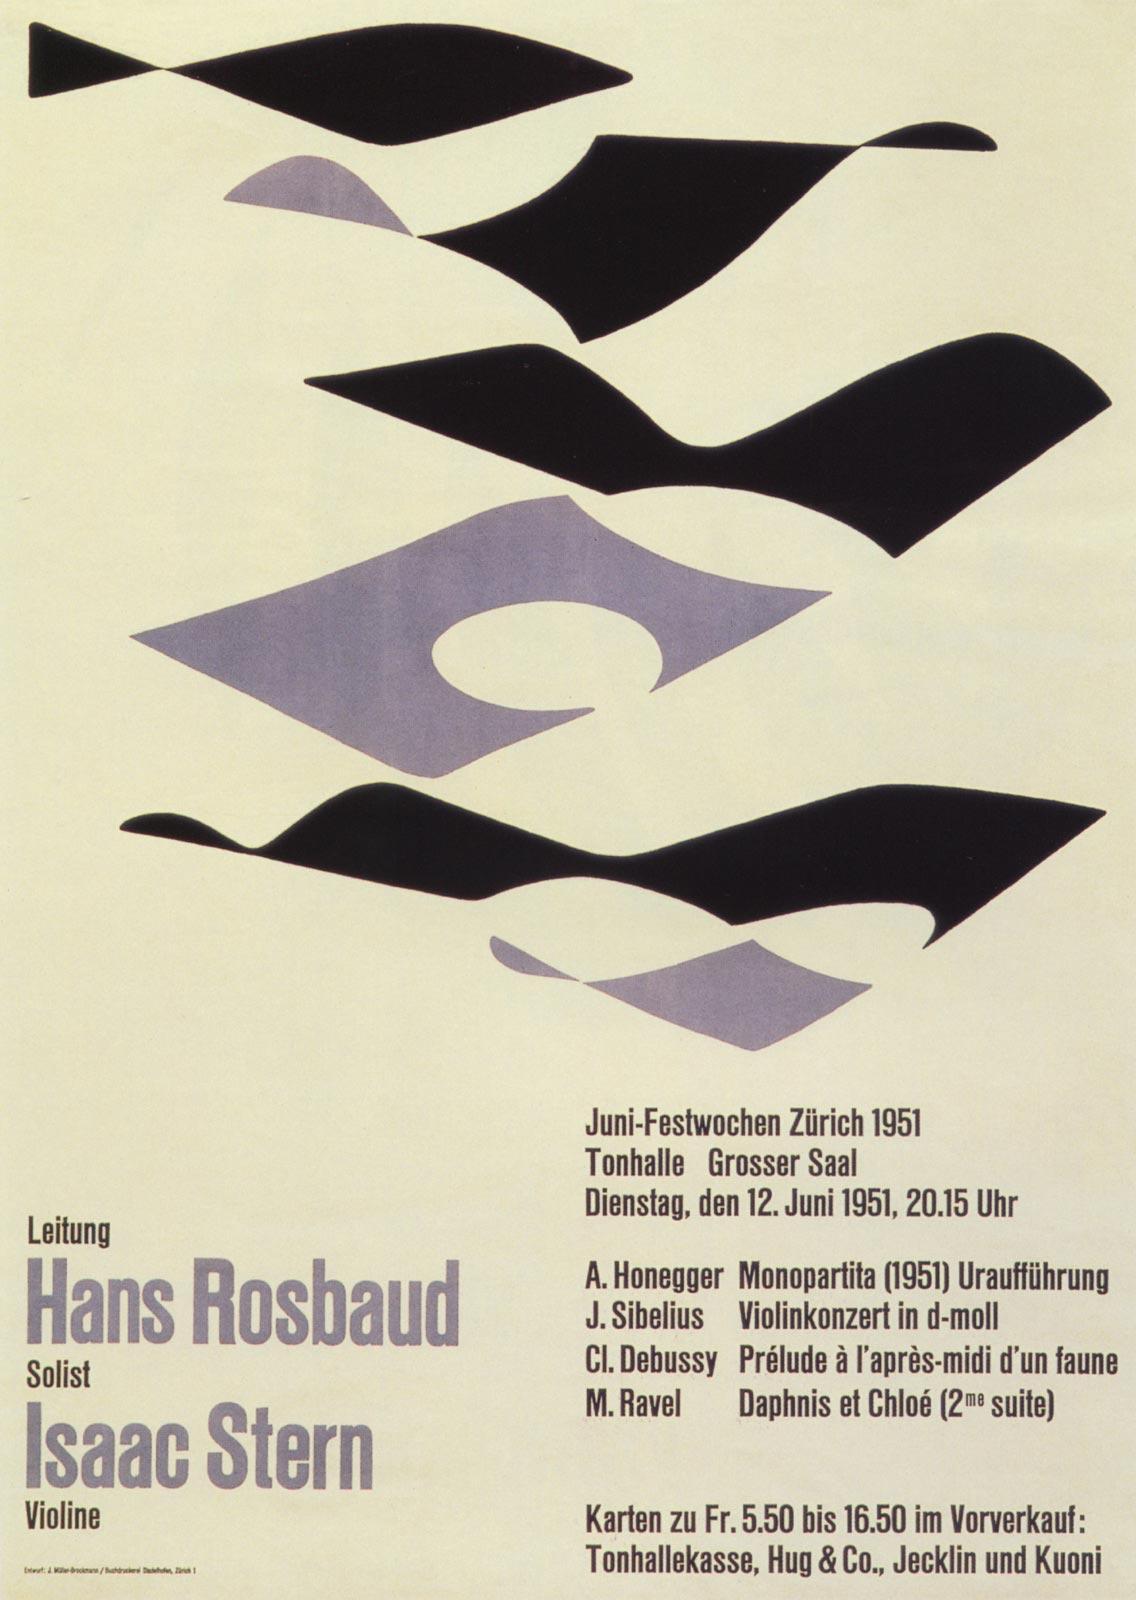 12. Zurich Tonhalle. June Festival. Concert poster, 1951